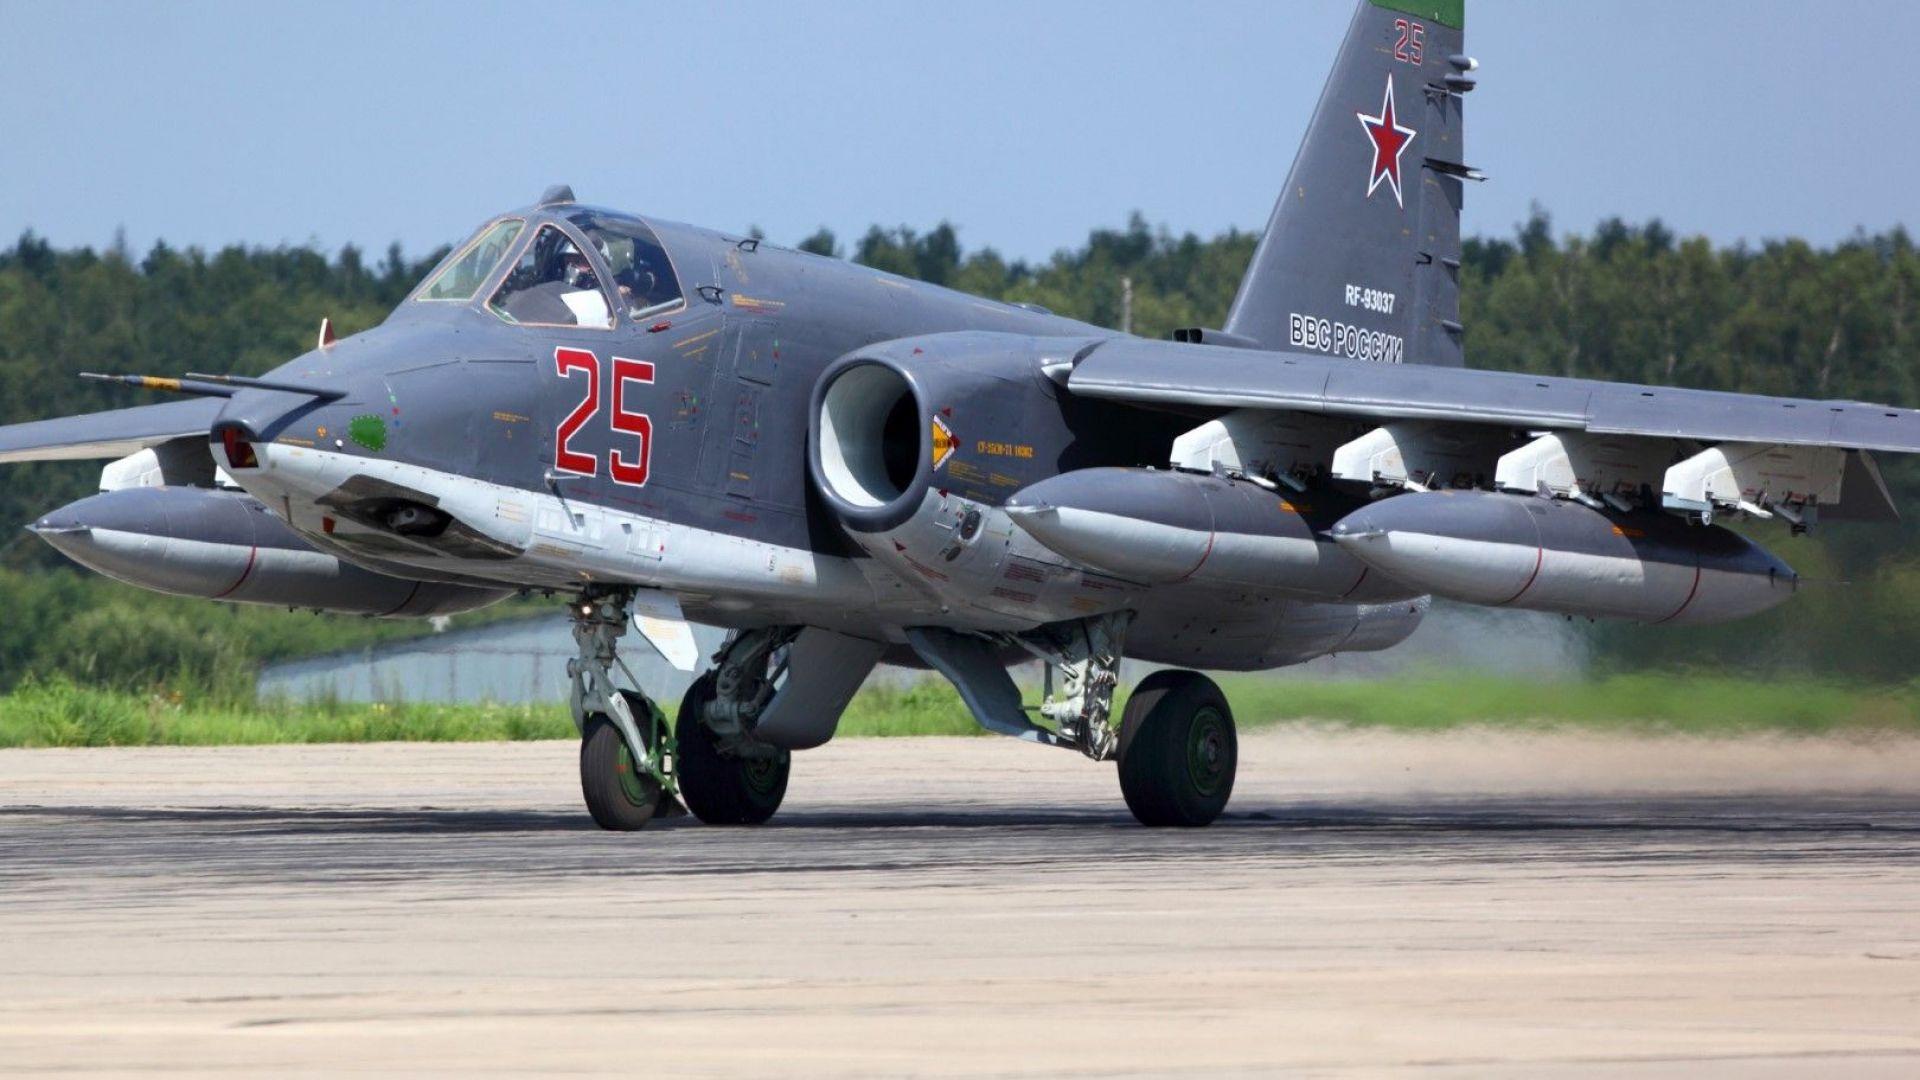 Оформя се скандал около ремонта на щурмовите Су-25